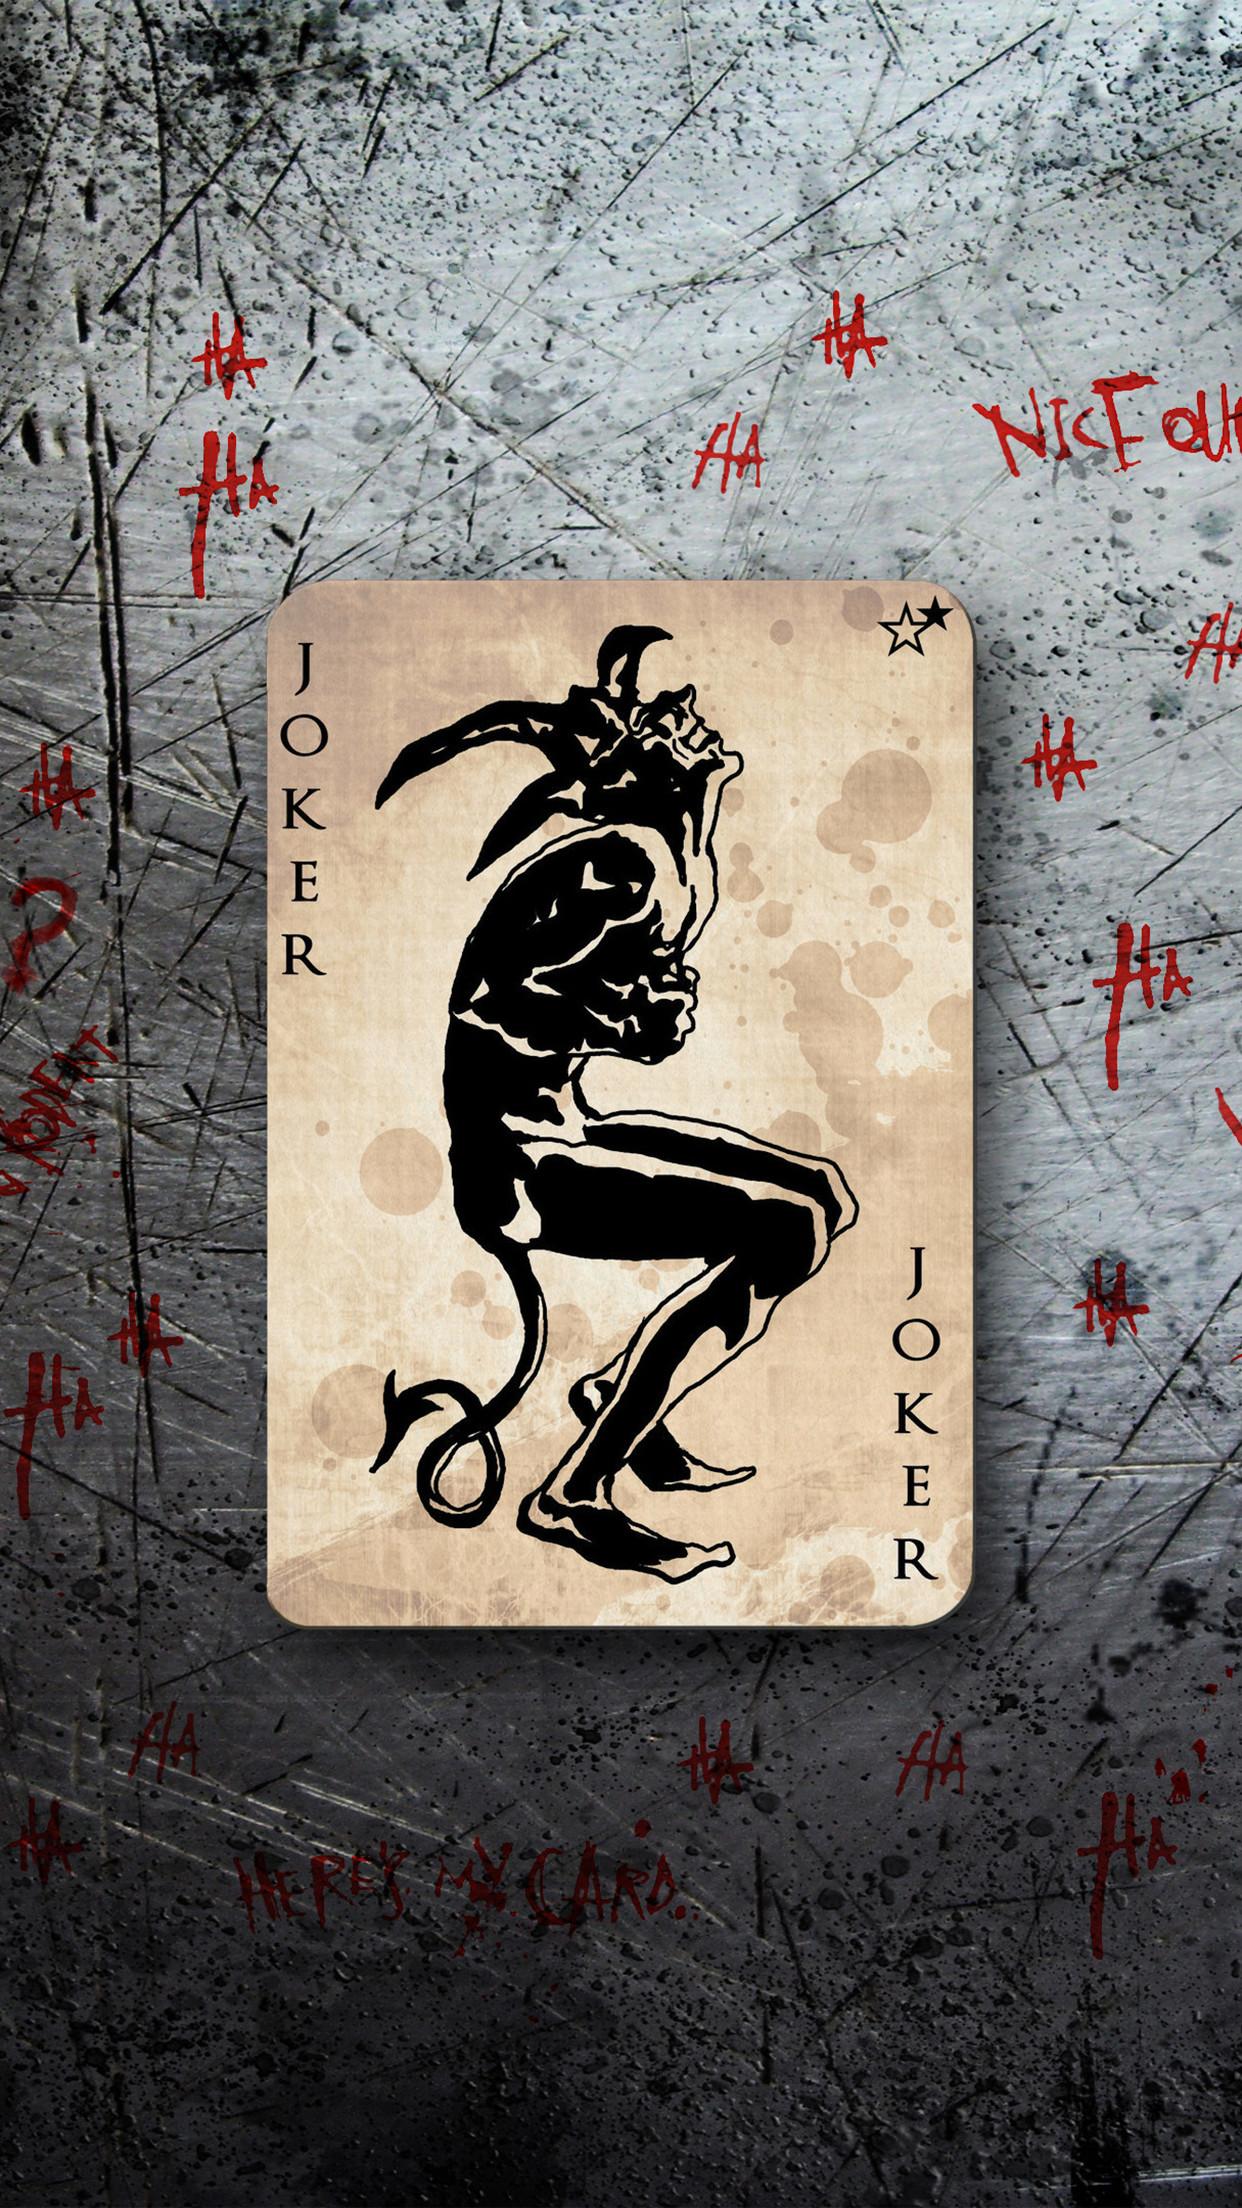 Joker Card iPhone 3Wallpapers Parallax Les 3 Wallpapers iPhone du jour .